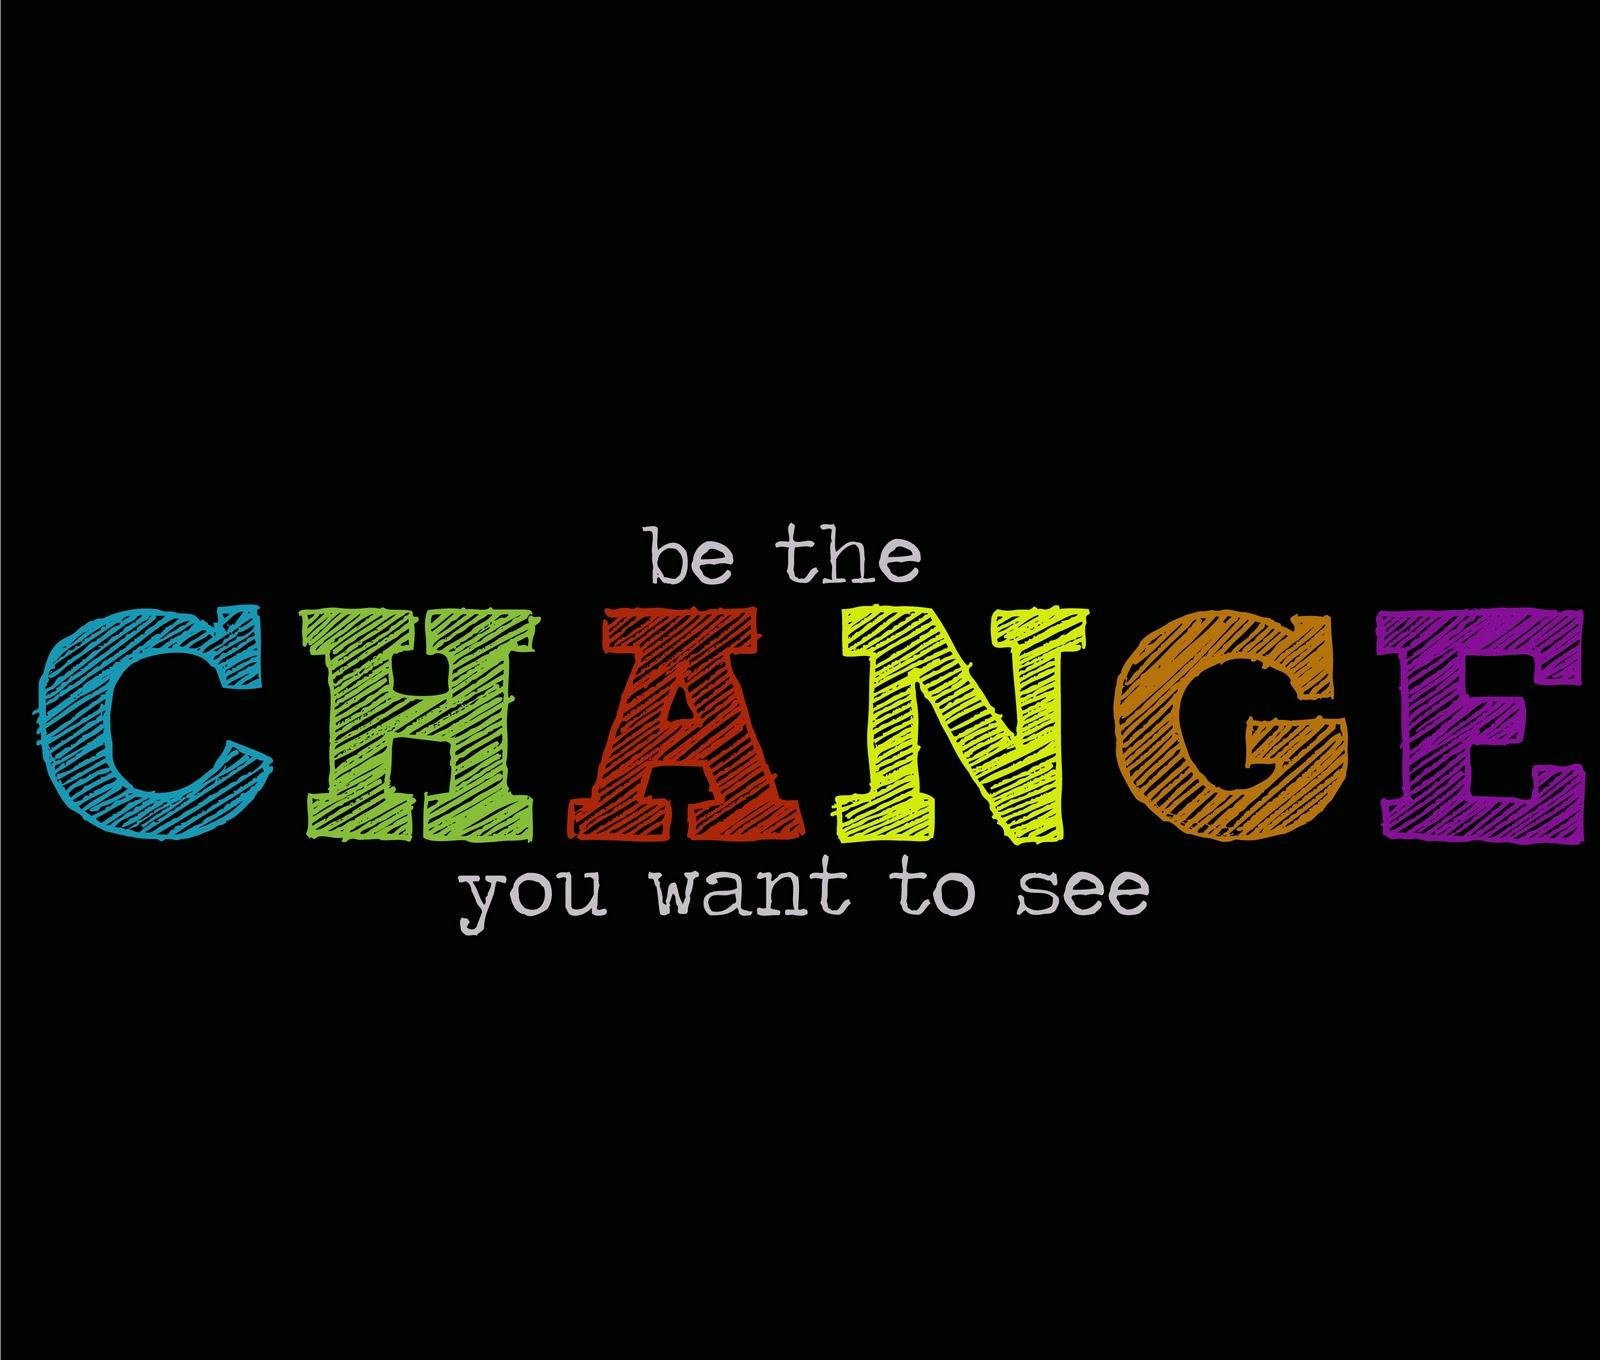 colorful-change-1-copy